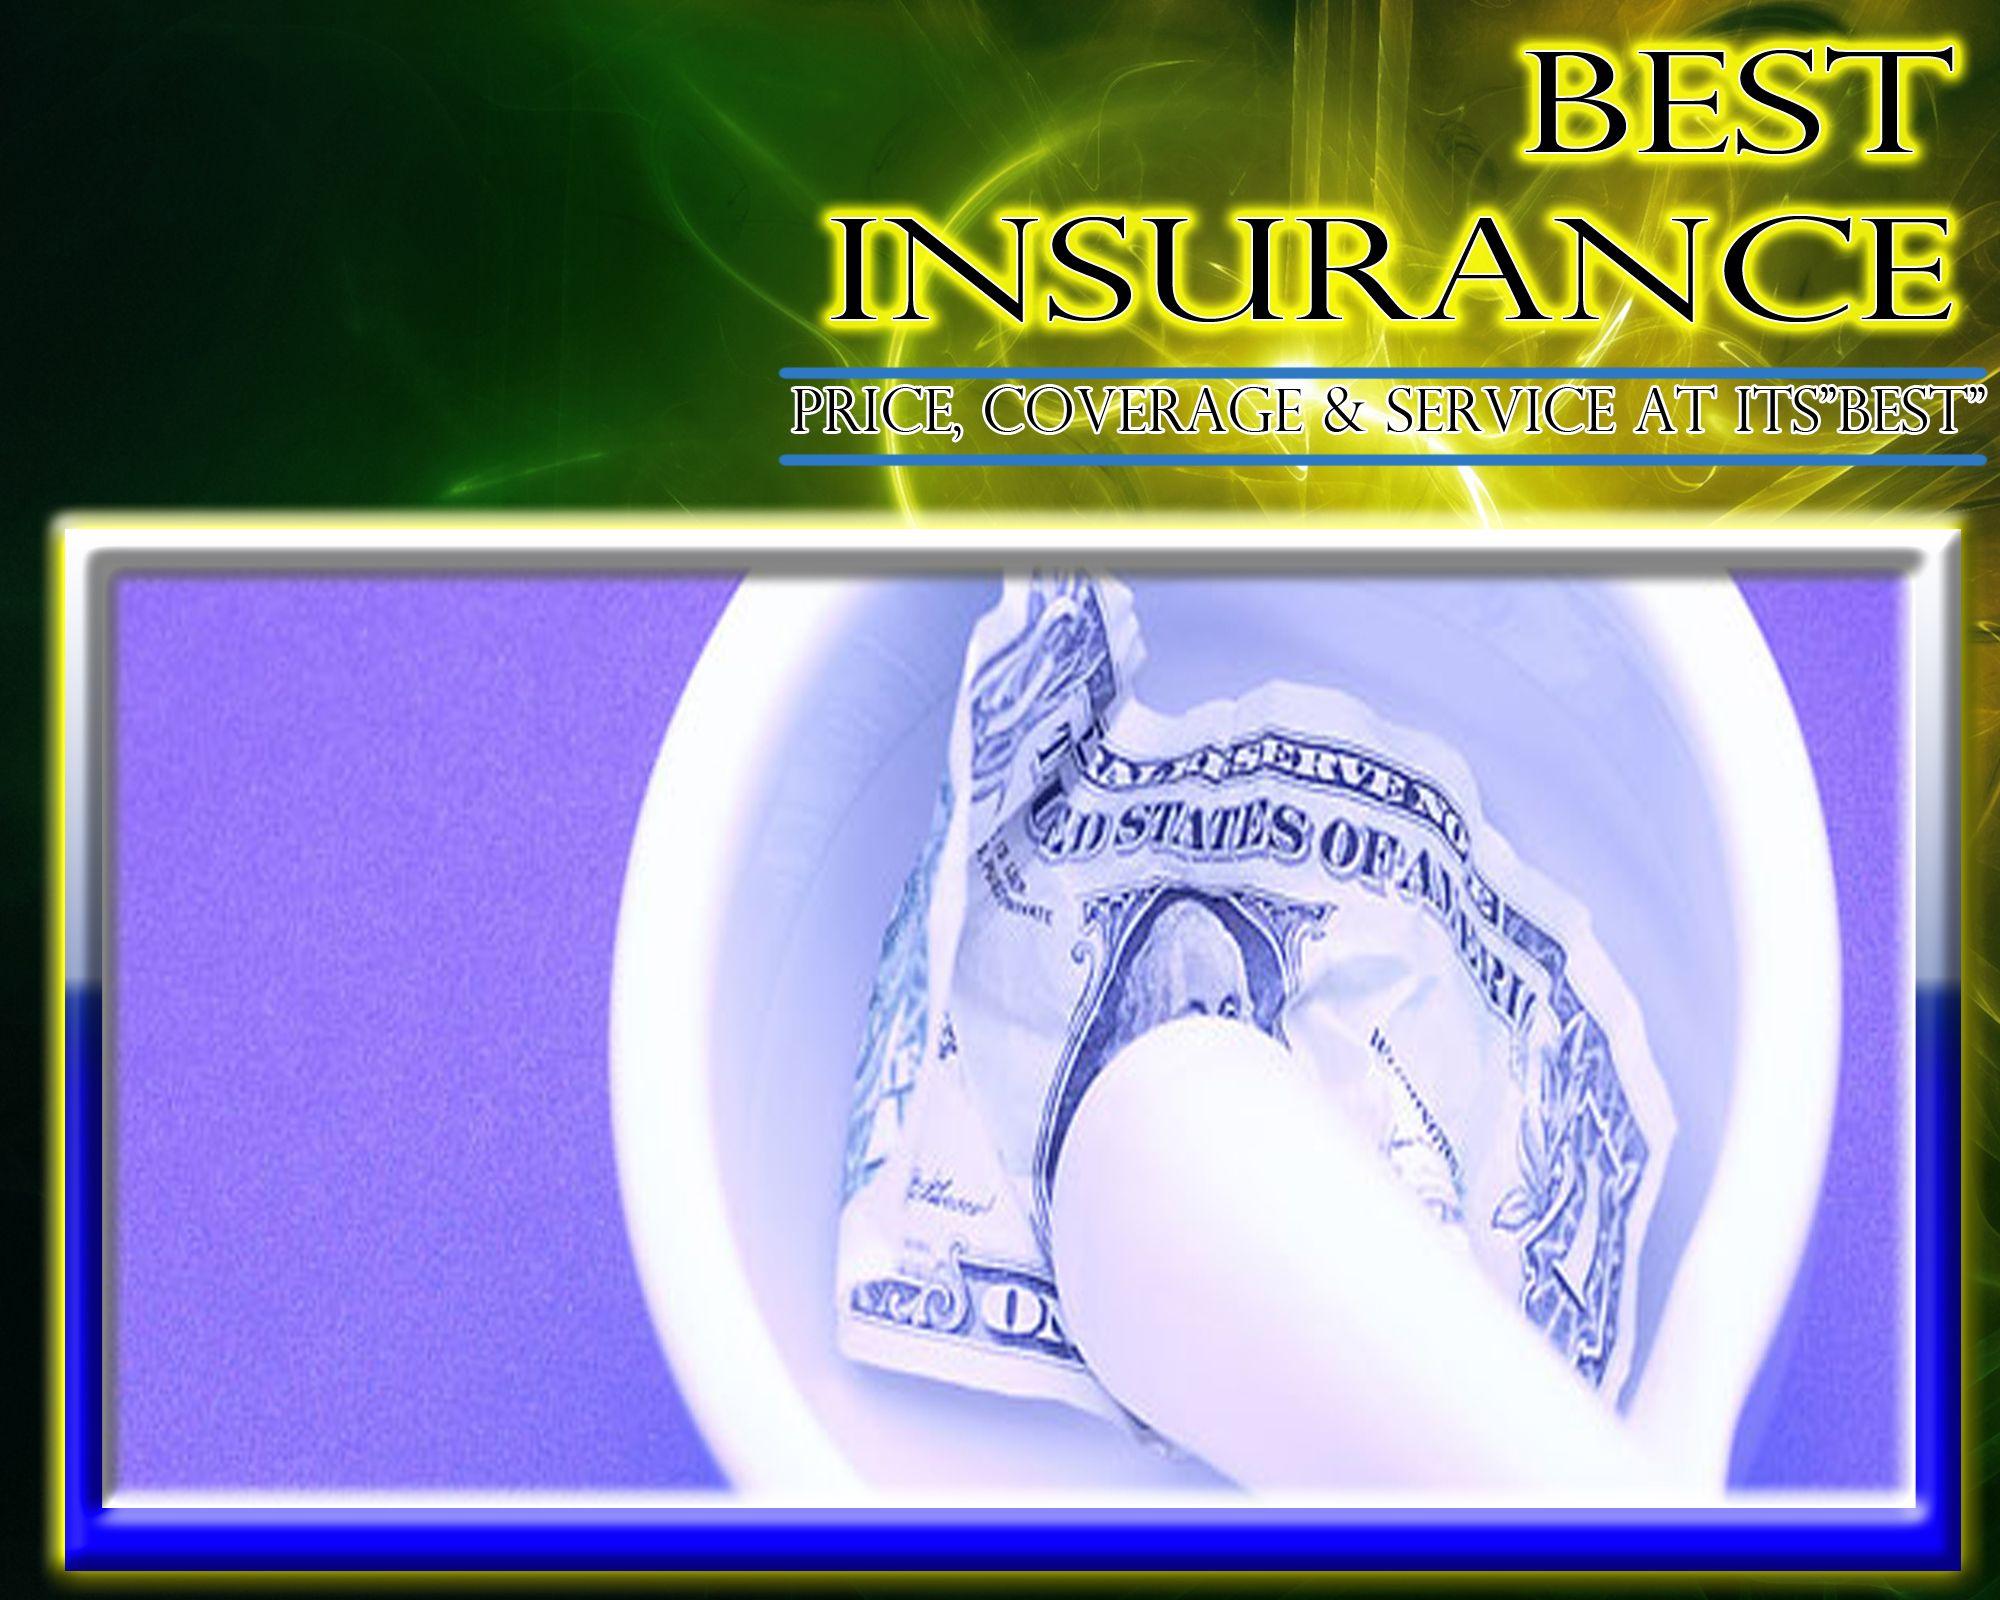 Home InsuranceFt.Lauderdale Regulation of Insurance